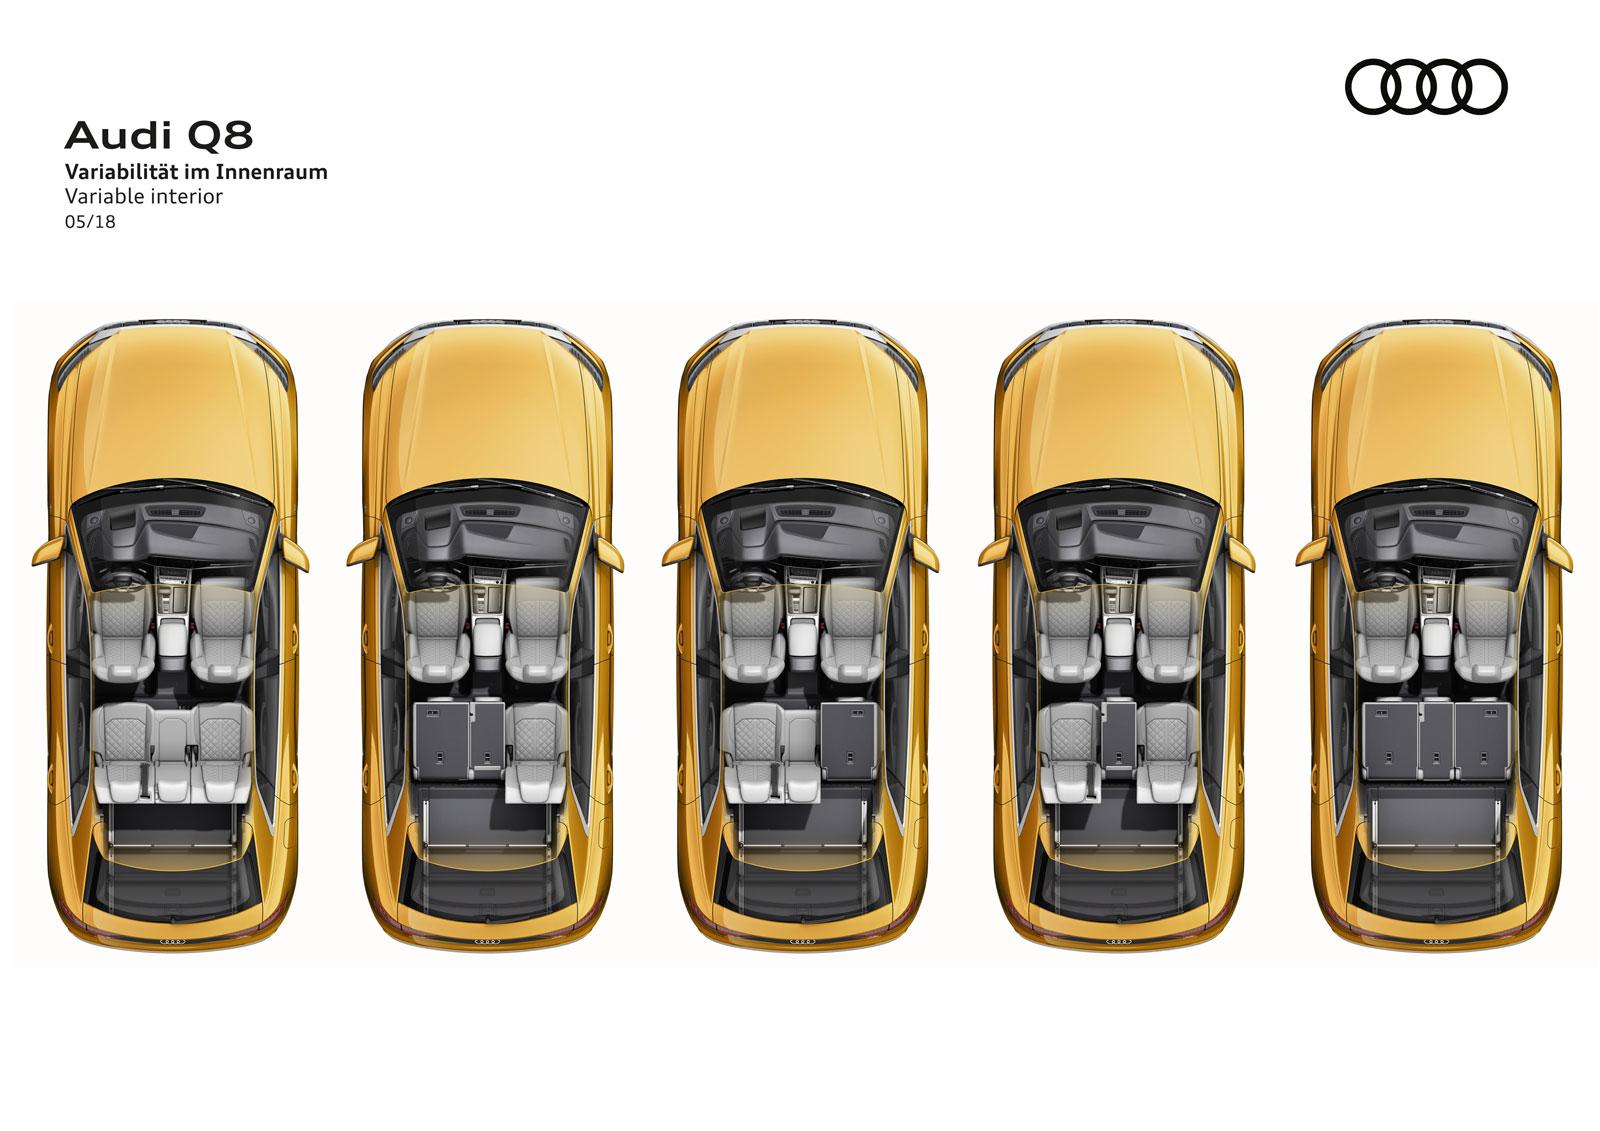 Audi Q8 Interior Seating Layout Variants Car Body Design